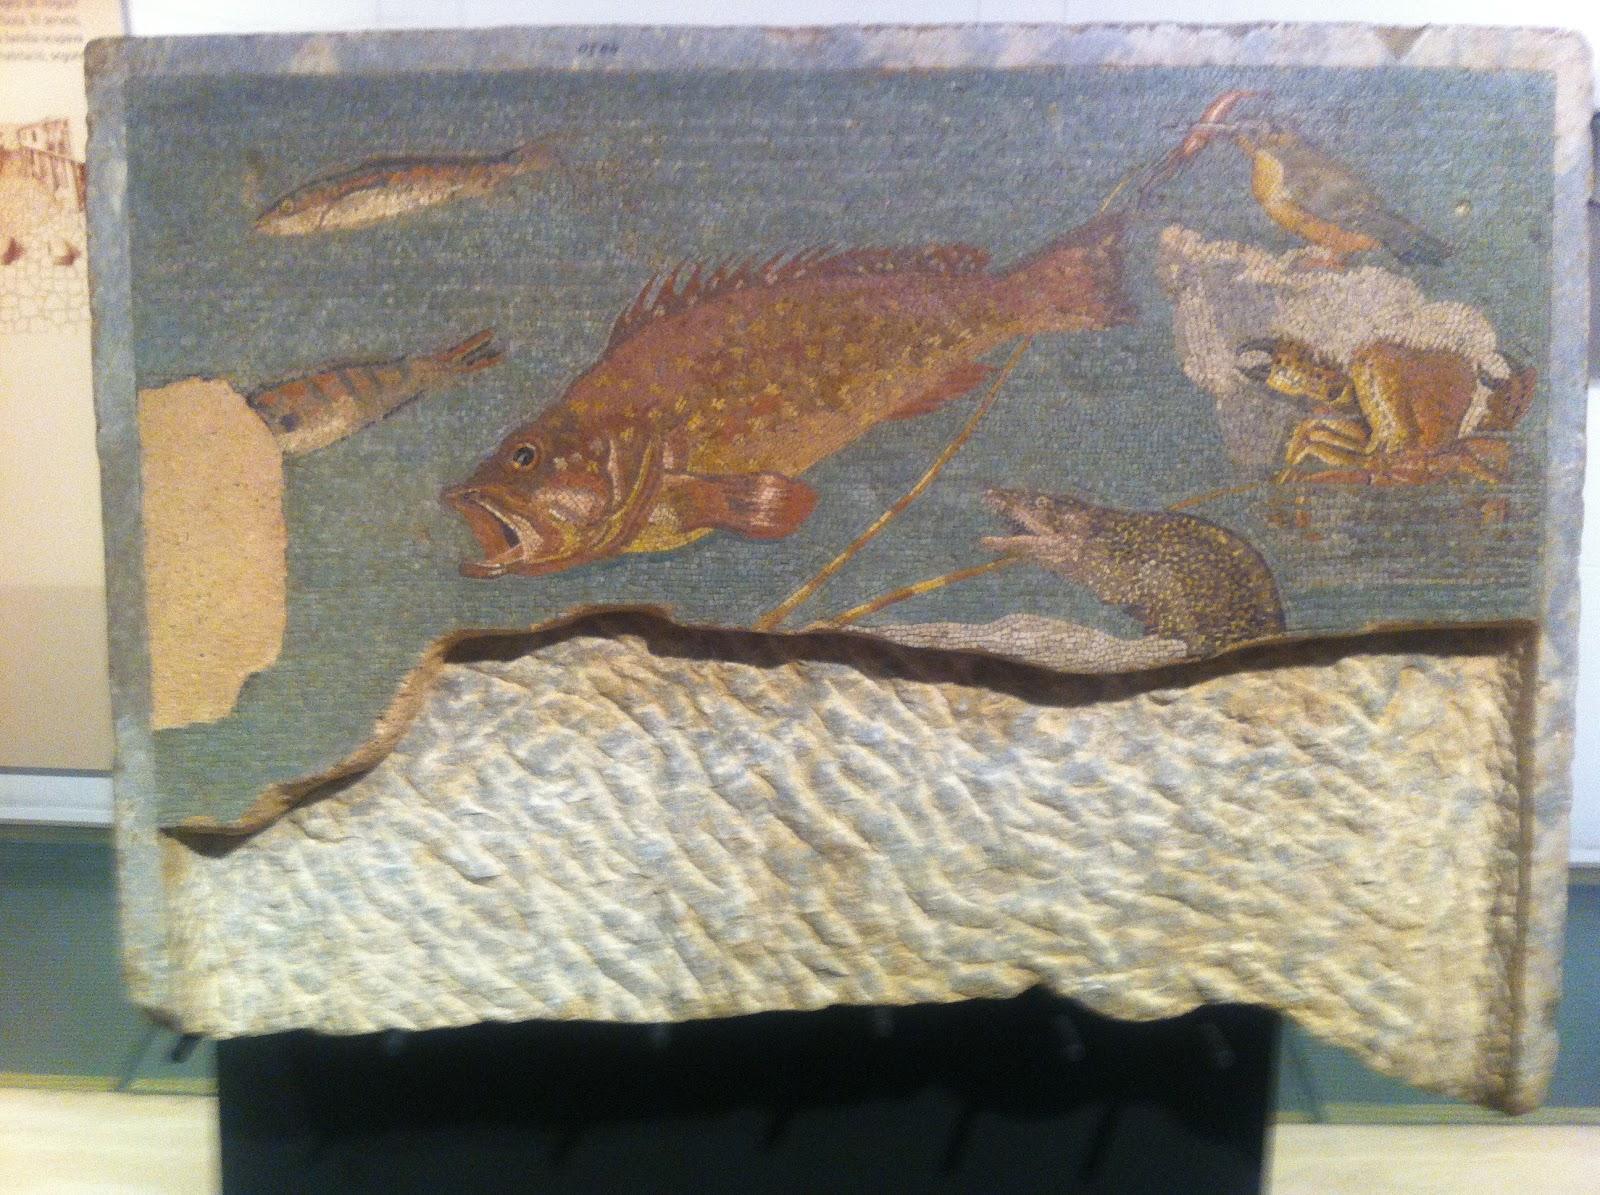 Tocho t8 museo arqueol gico de catalu a en barcelona - Murales de ceramica artistica ...